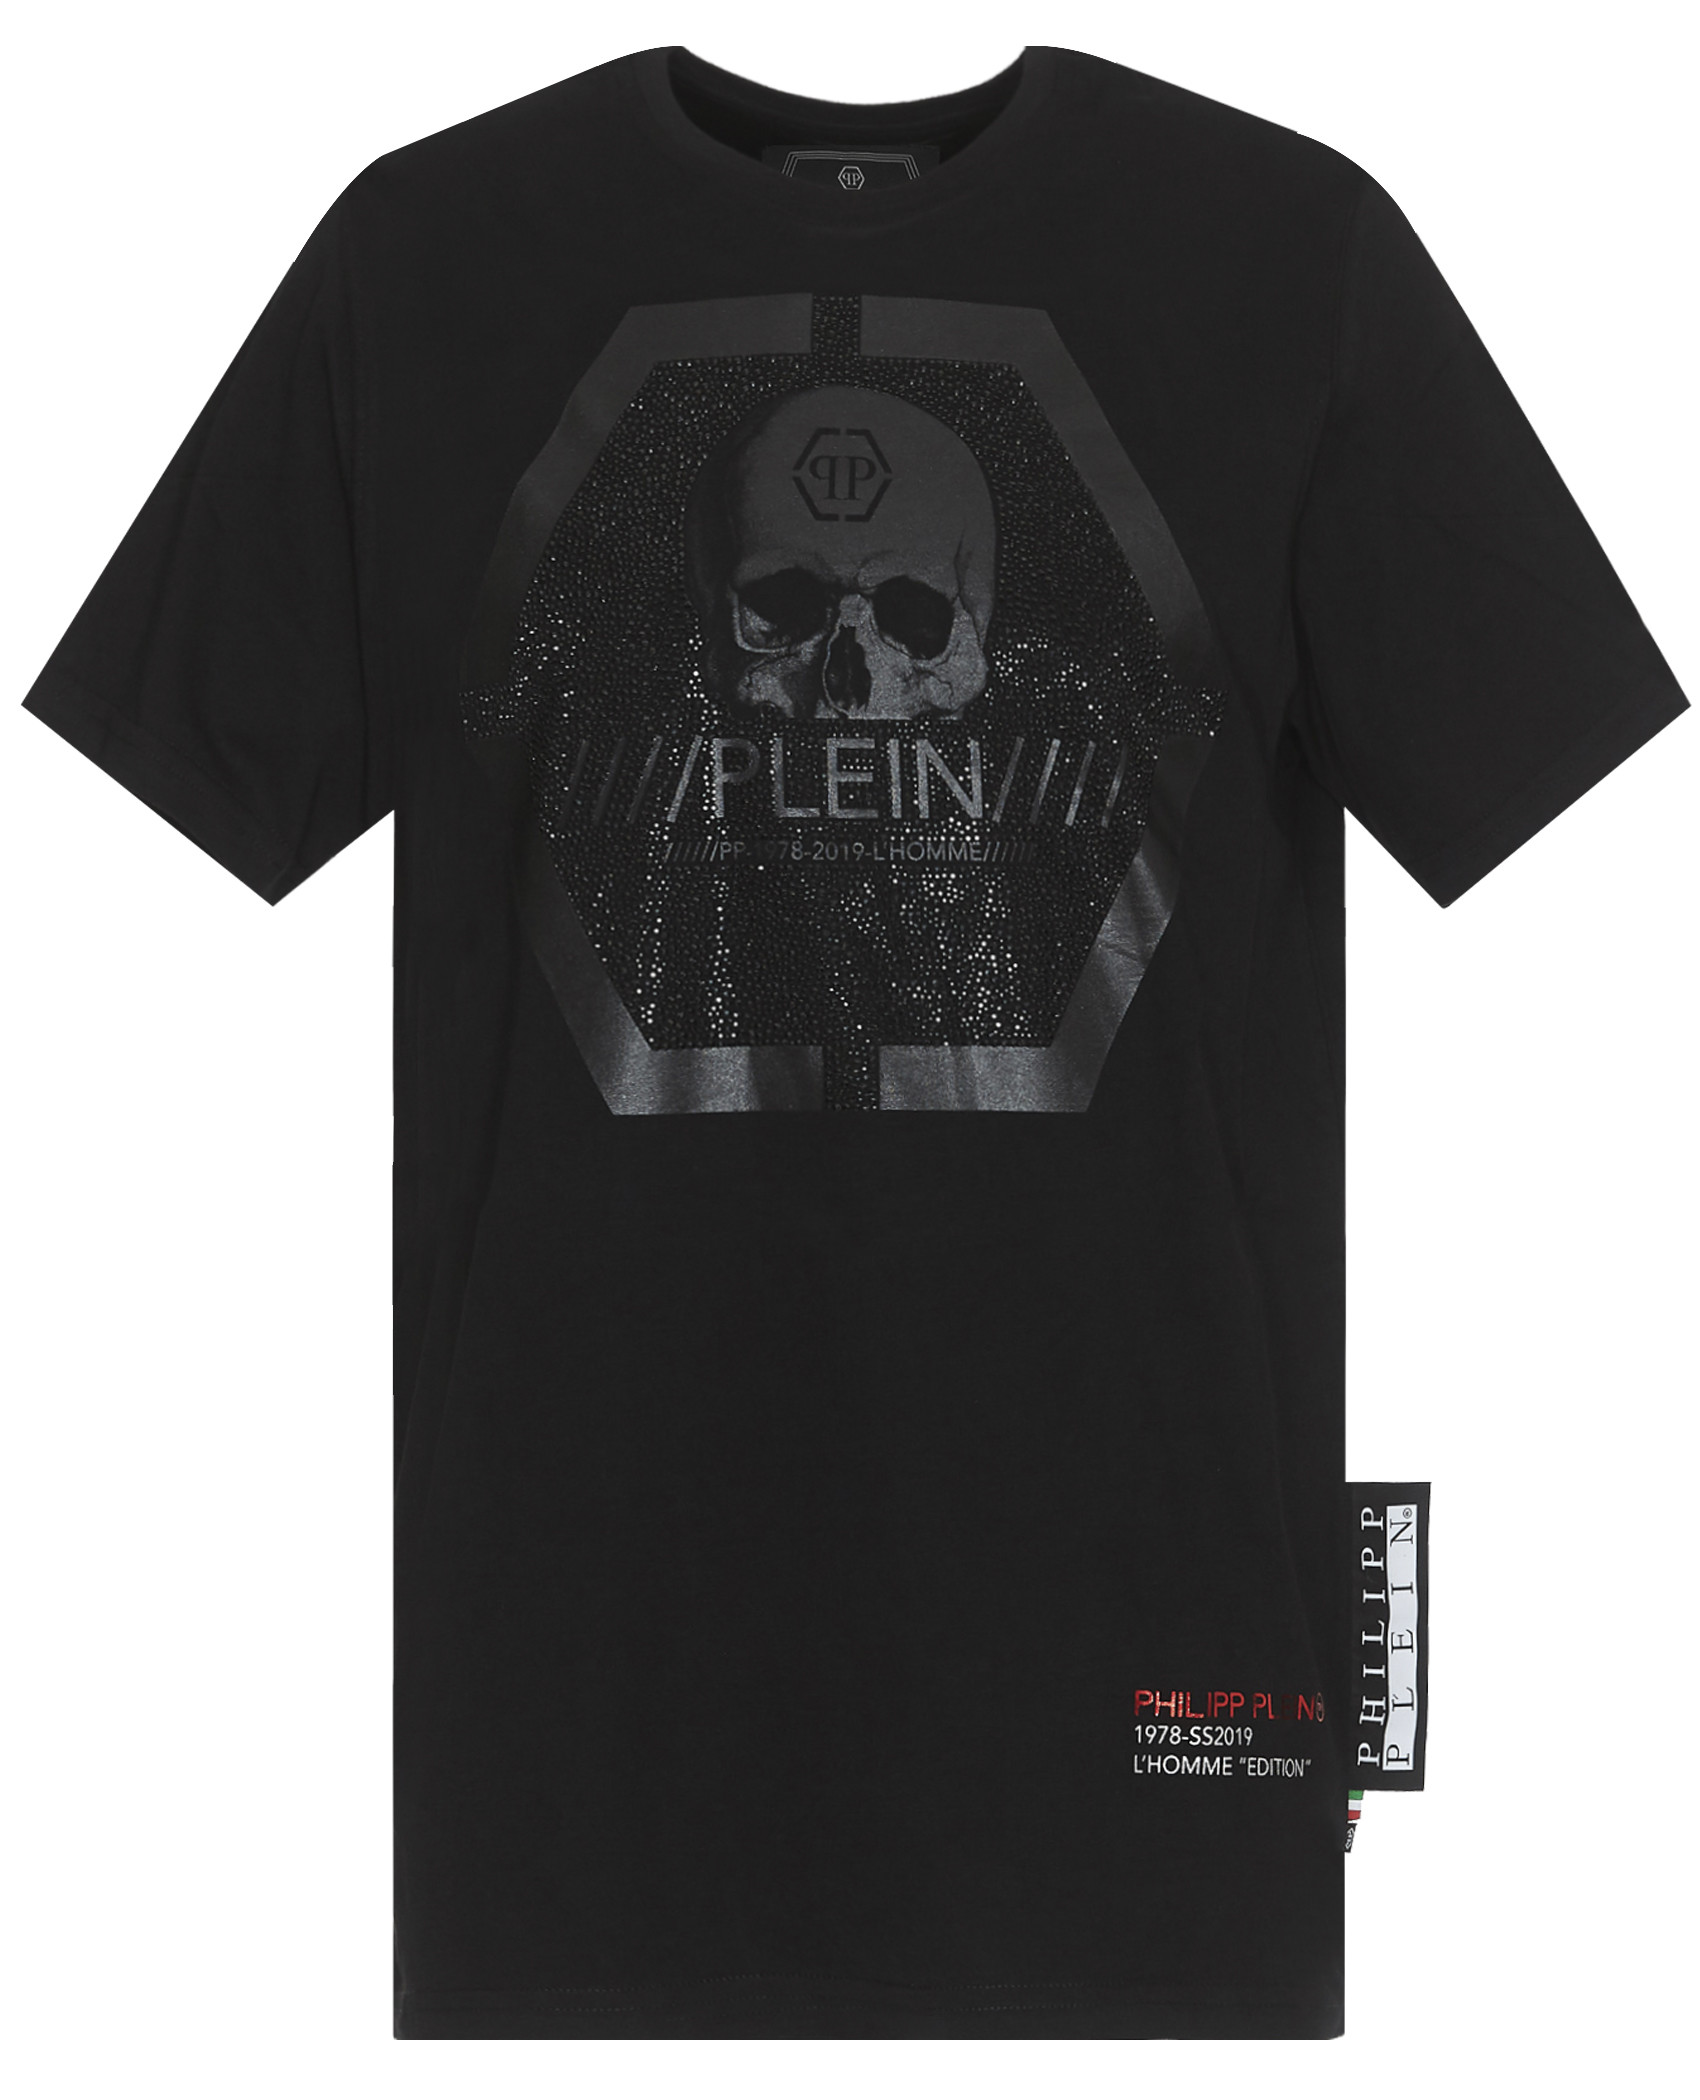 Tee-shirts  Philipp plein MTK3084 Platinum Cut Round Neck Skull BLACK/BLACK